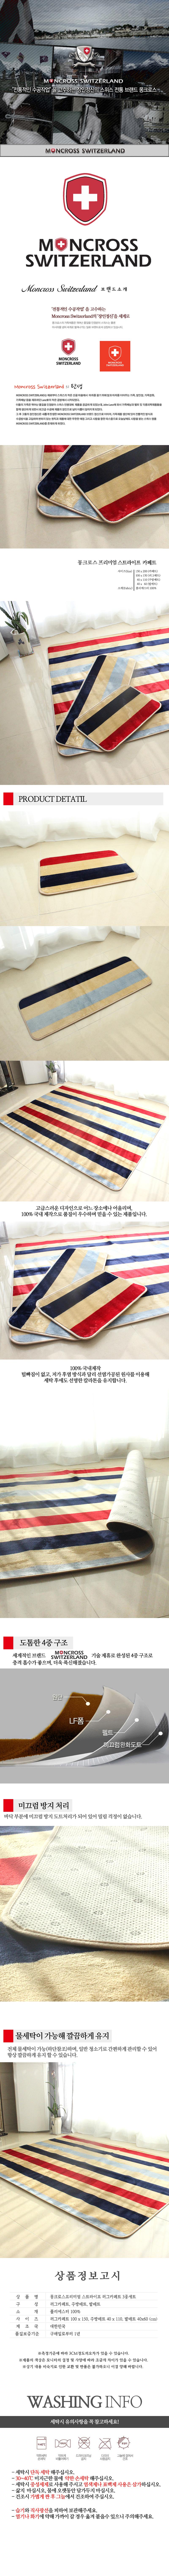 M_oncross_Striped_rug_carpet_3P.jpg